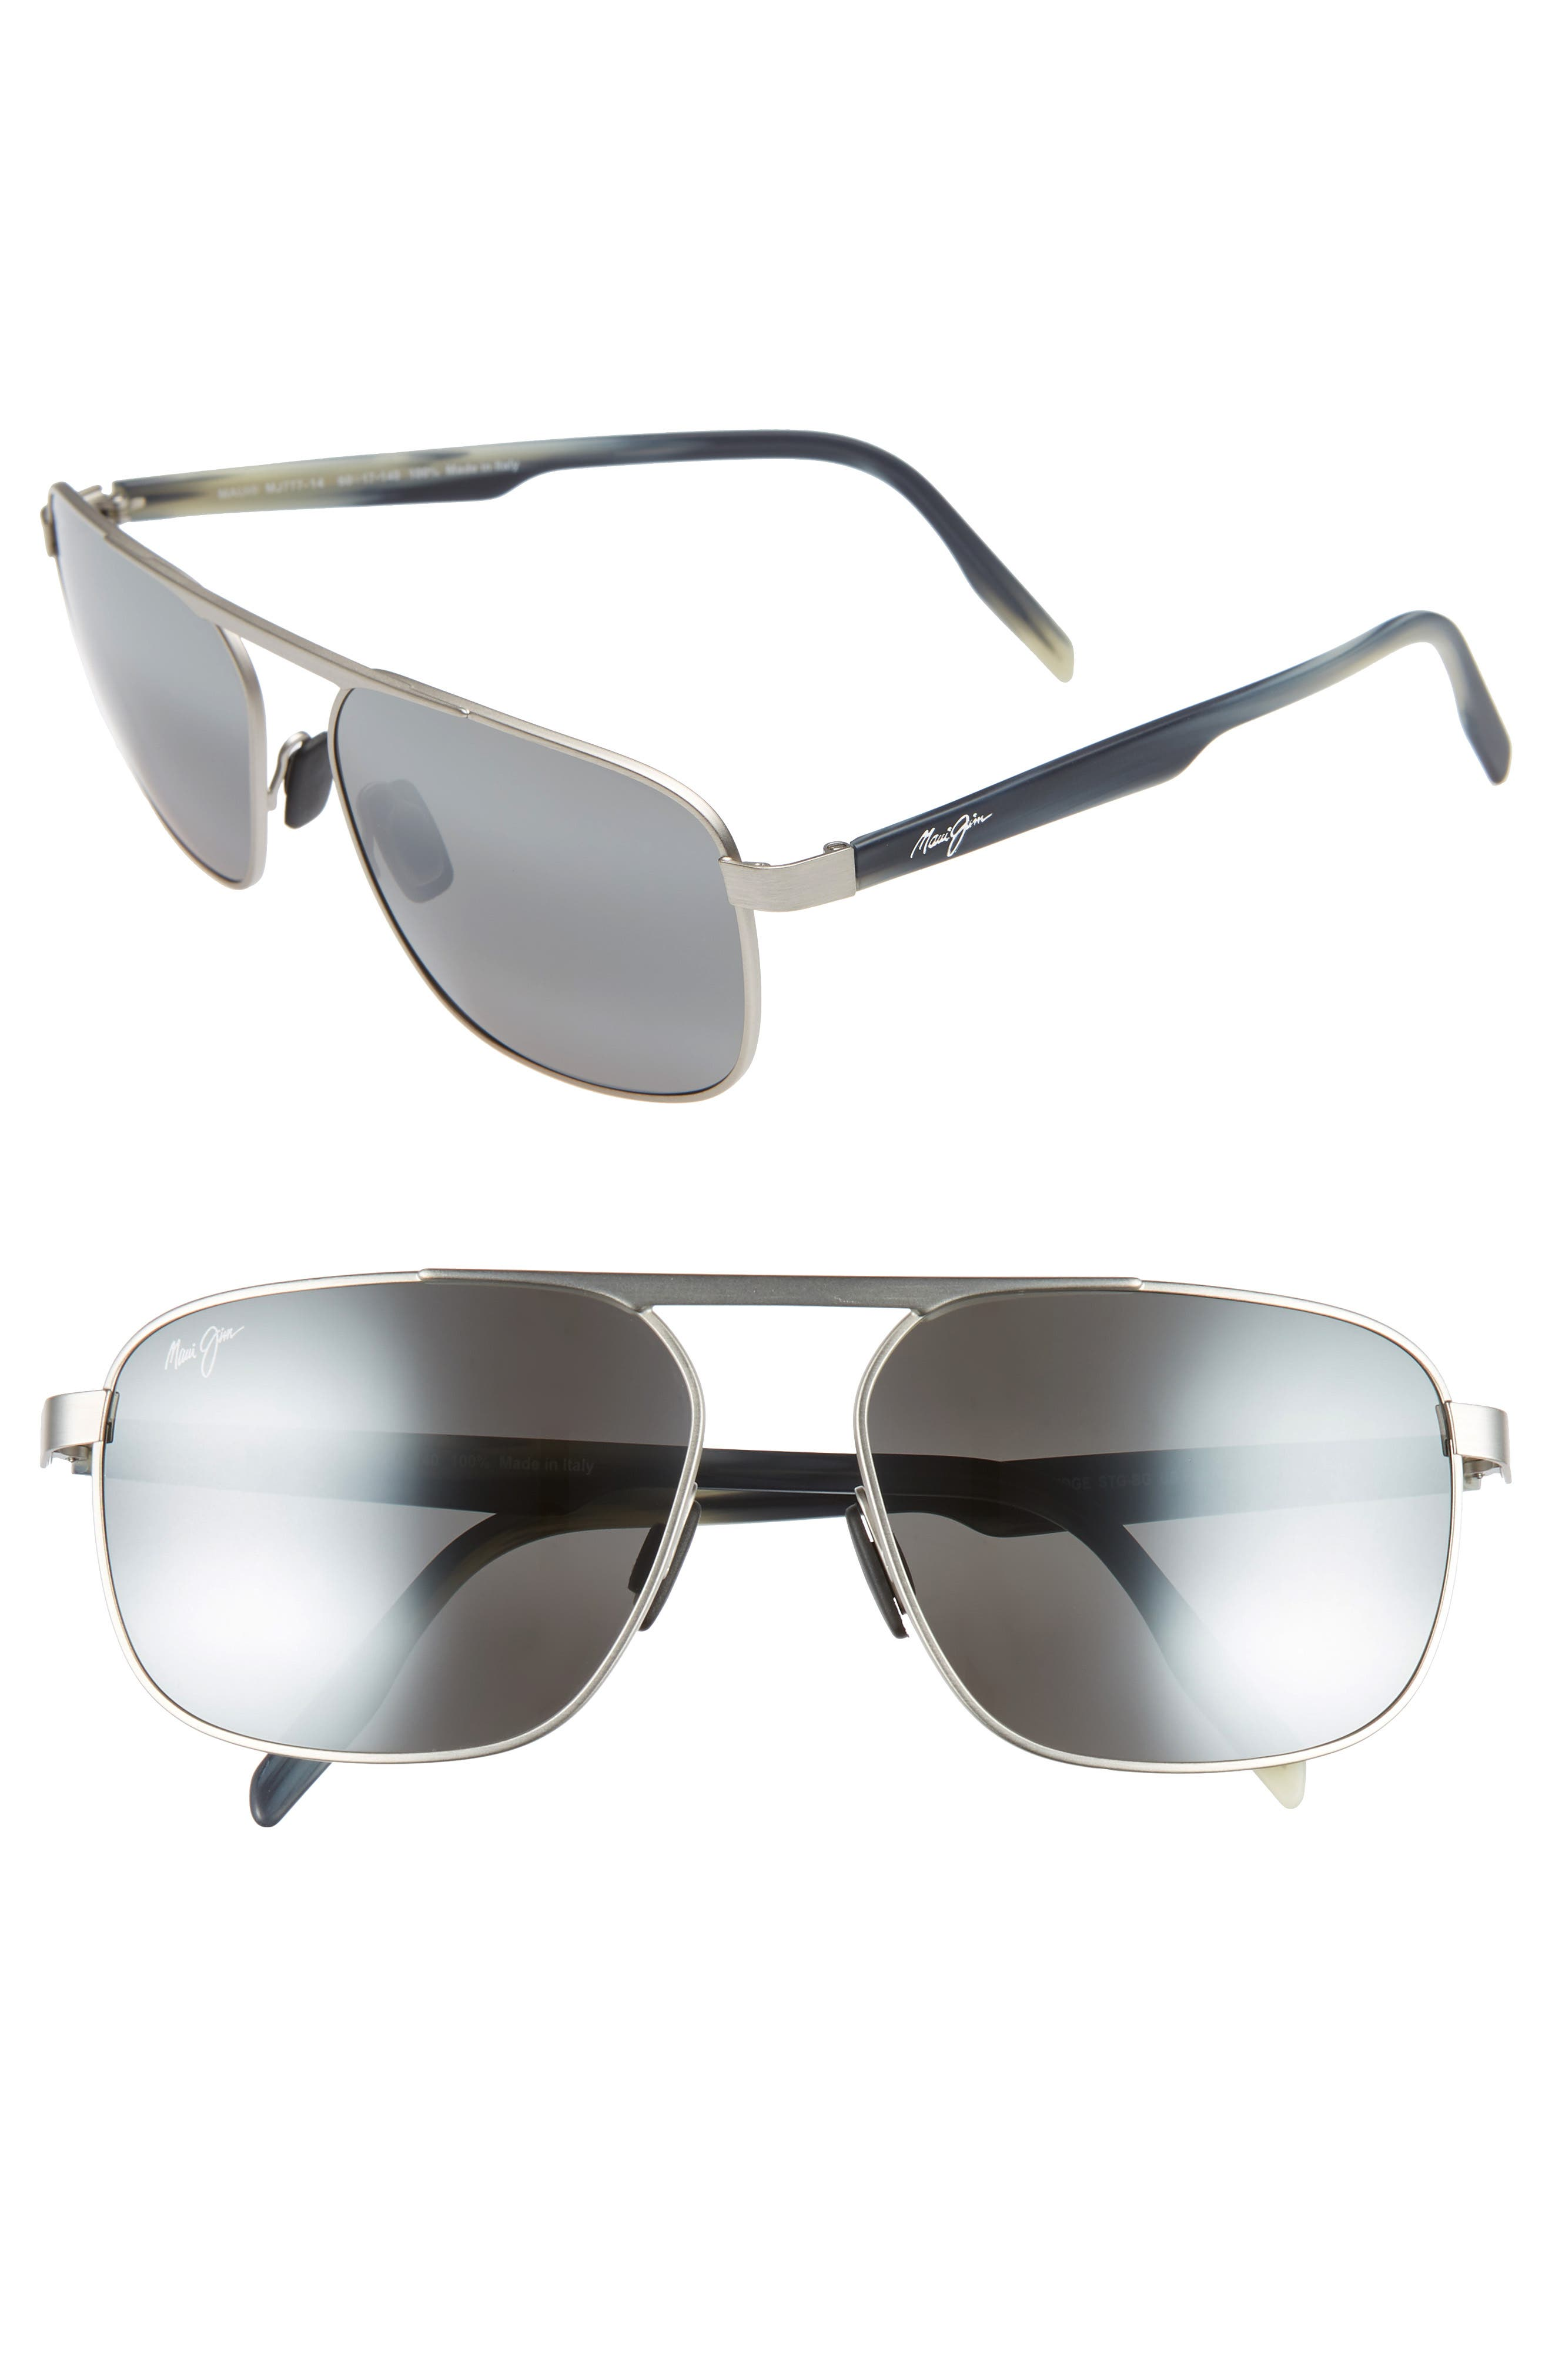 Waihe'e Ridge 60mm Polarized Sunglasses,                             Main thumbnail 1, color,                             BRUSHED GREY/ NEUTRAL GREY